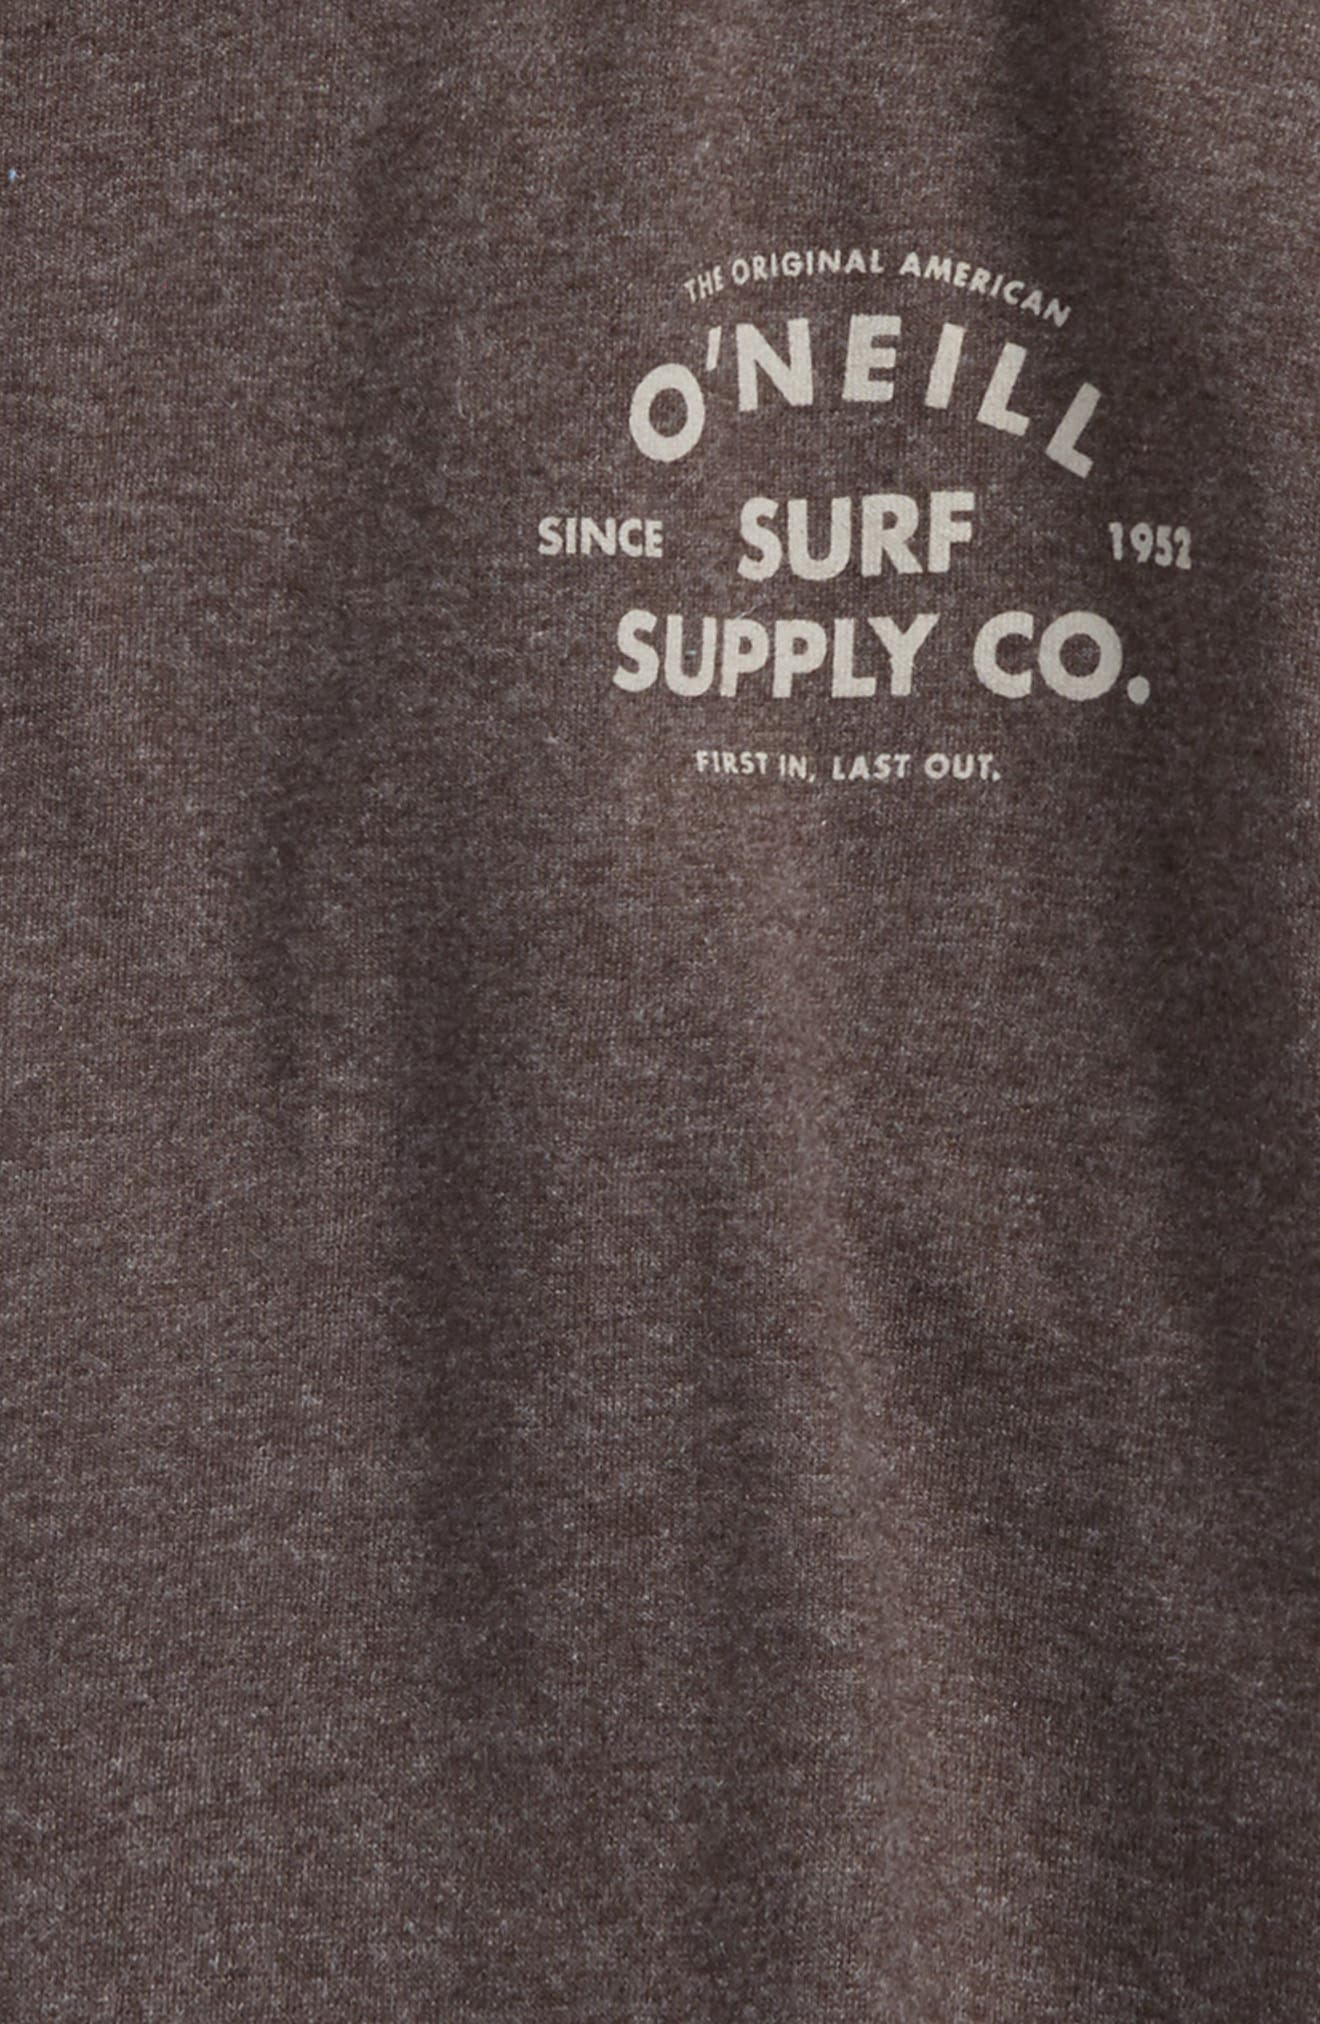 Gonner Graphic T-Shirt,                             Alternate thumbnail 3, color,                             Heather Black